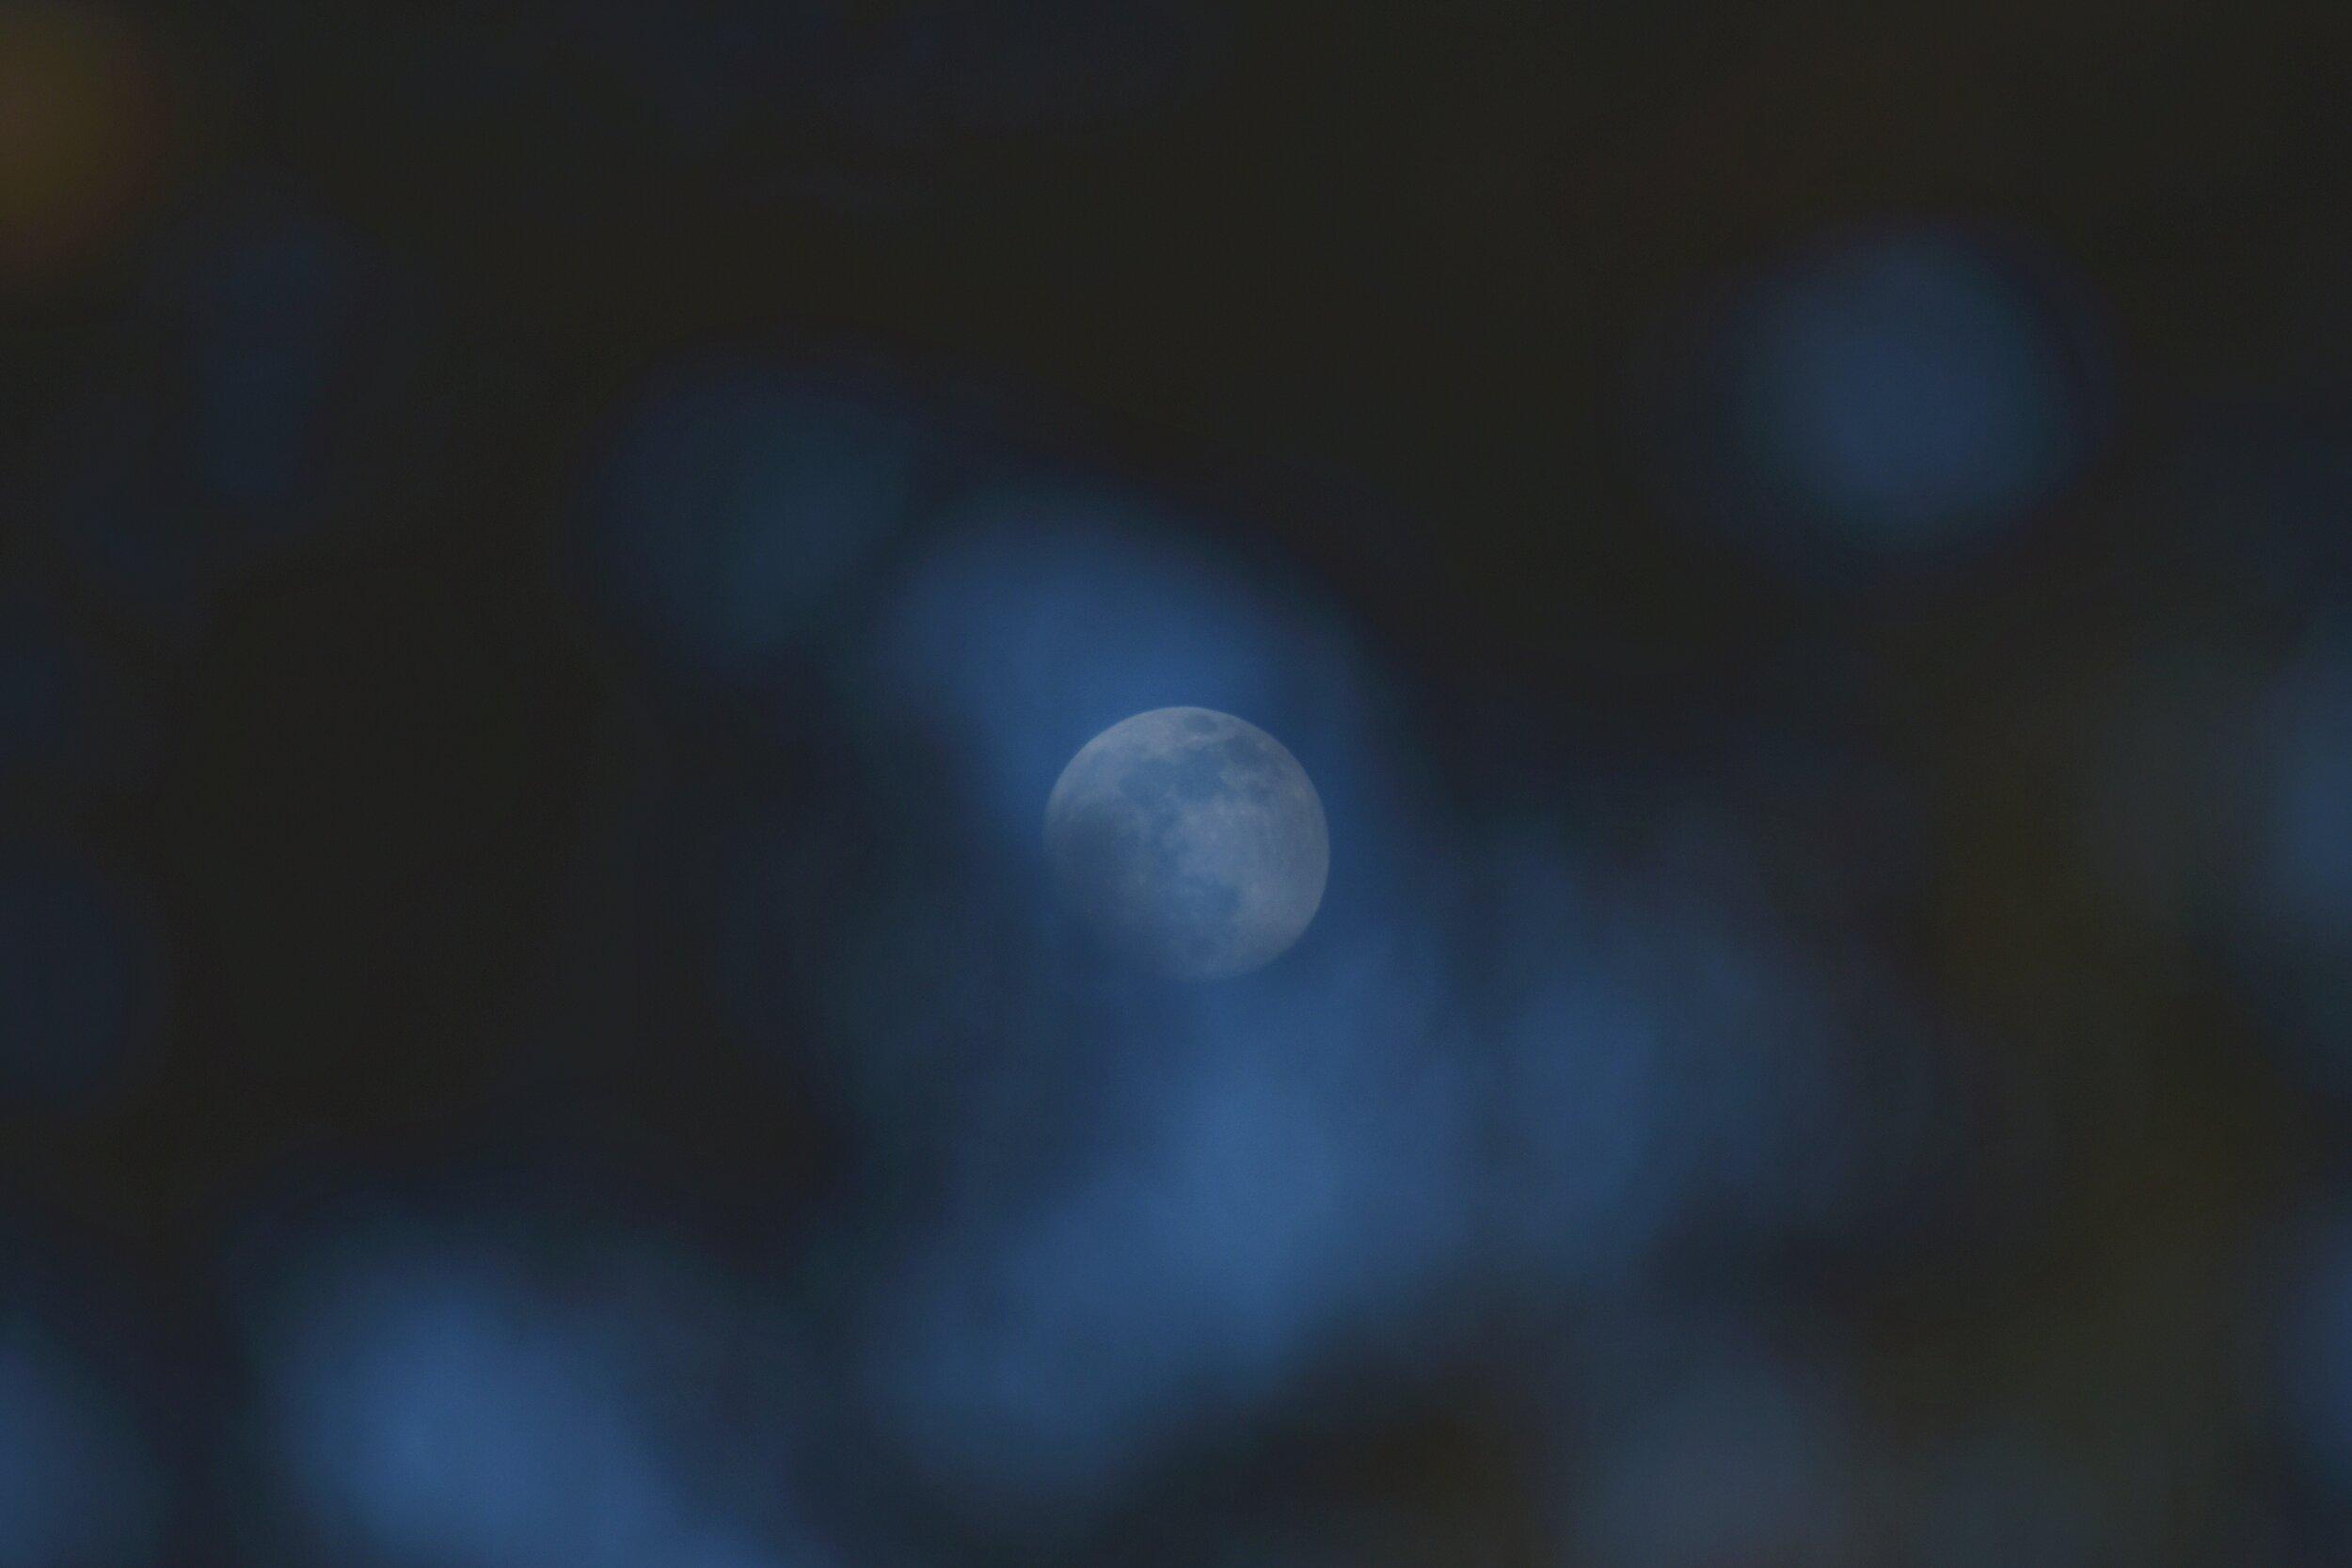 blur-crater-depth-of-field-1921692.jpg